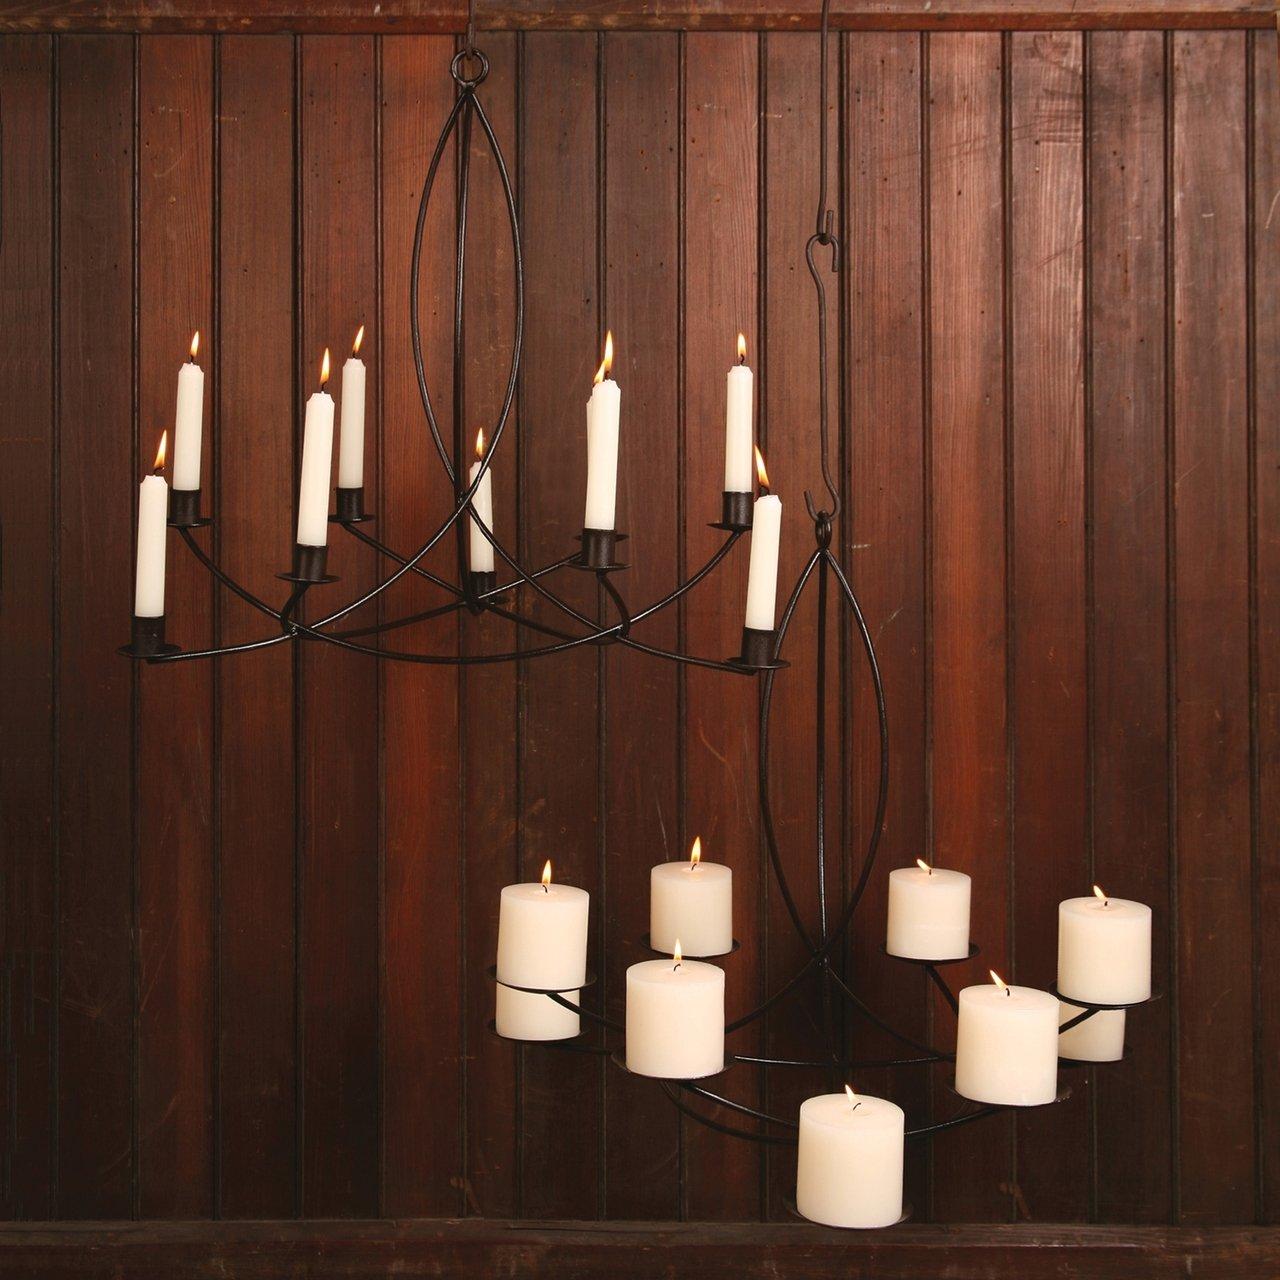 Liliane Candle Chandelier - Taper by Intelligent Design